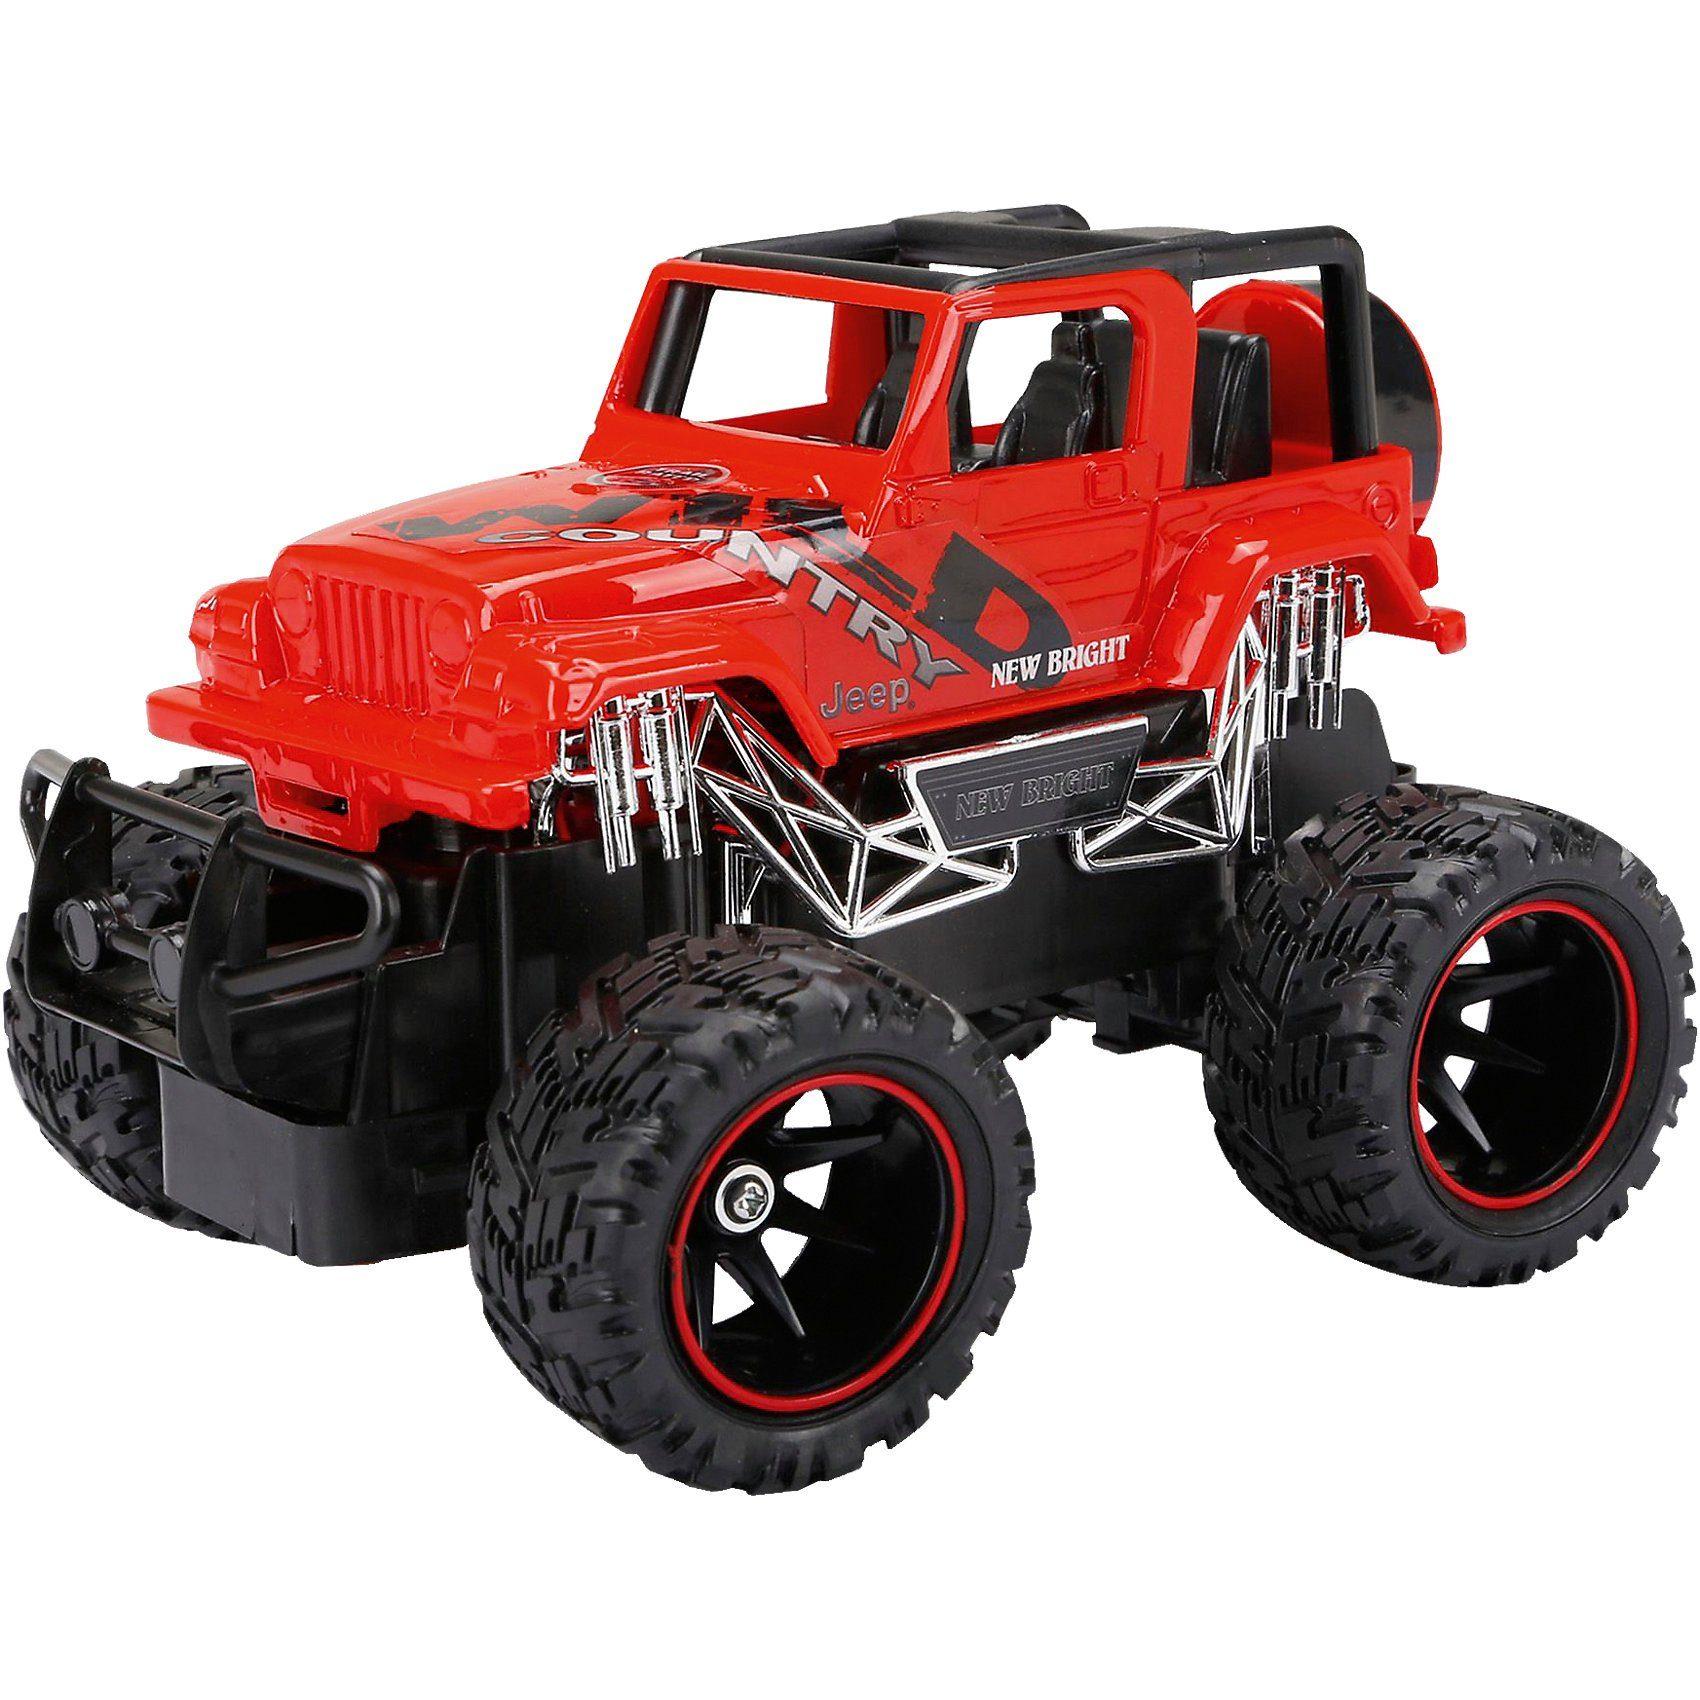 New Bright RC Fahrzeug Jeep Wrangler rot 1:24